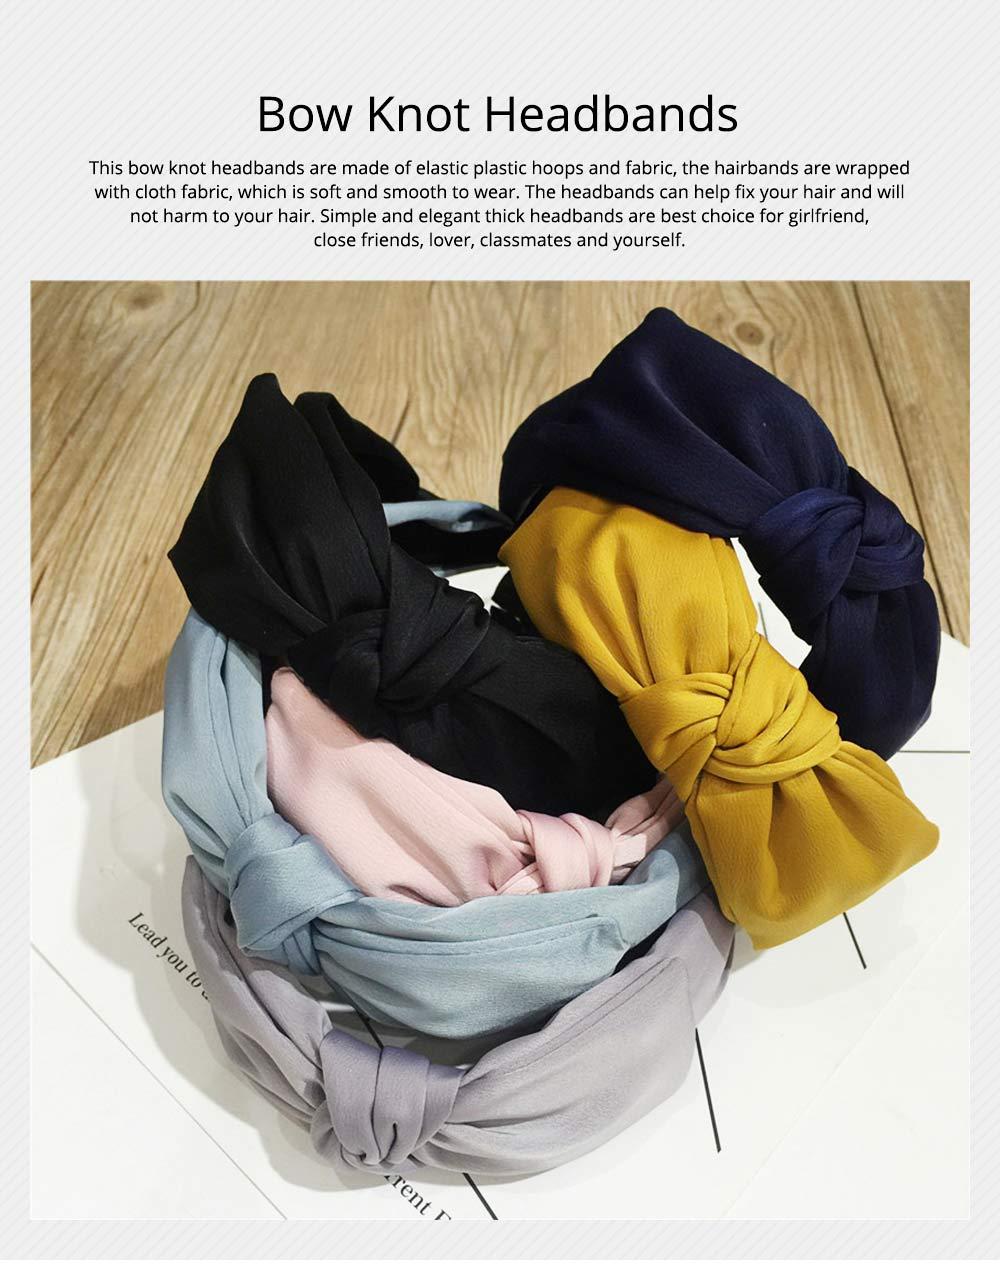 Bow Knot Headbands Pure Color Elastic Head Wrap Twist Knot Hairbands Cross Wide Headbands for Women 0